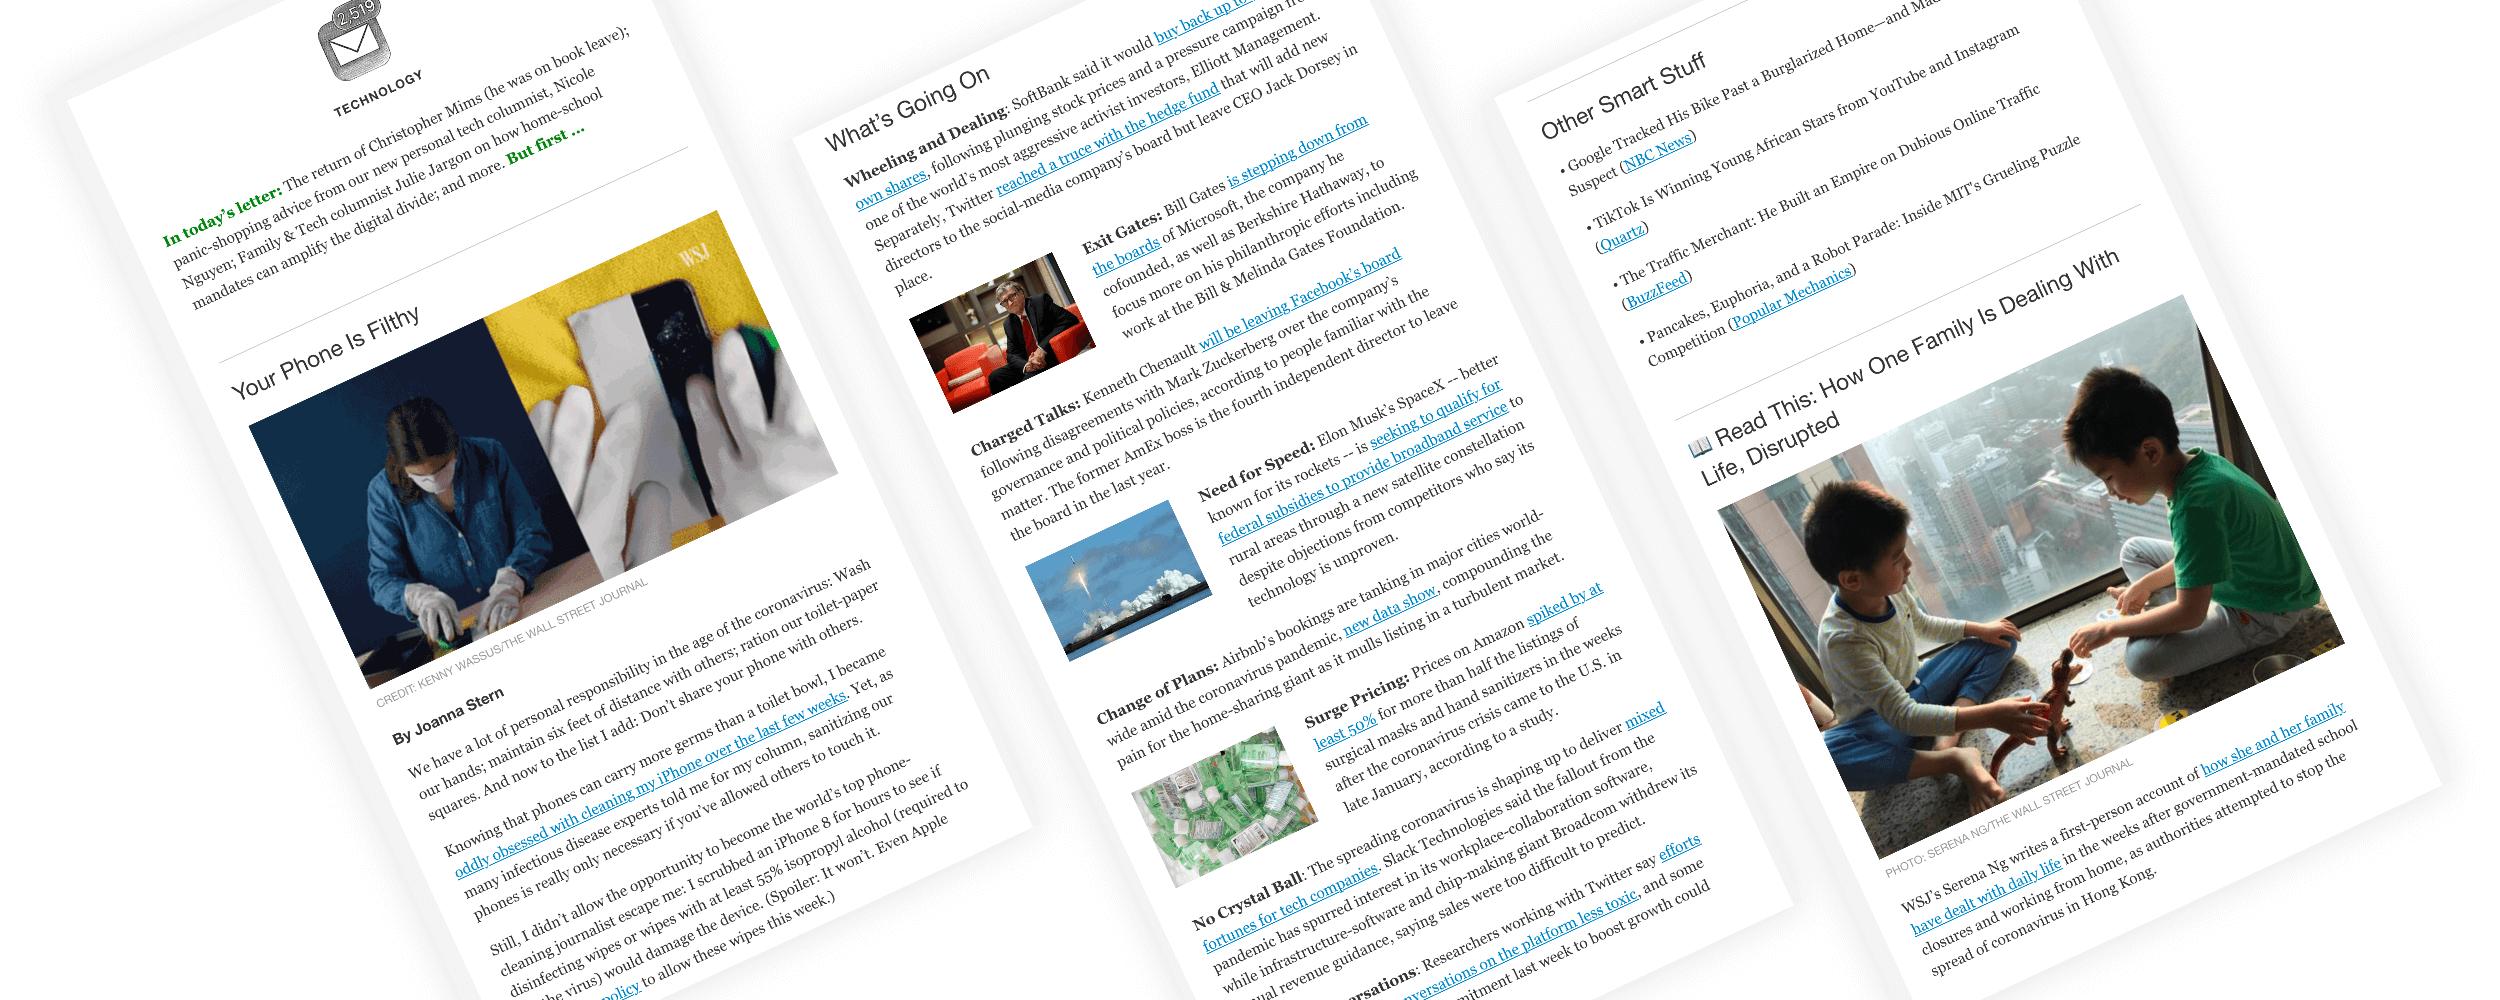 WSJ 科技版的《Tech Weekly》邮件周报